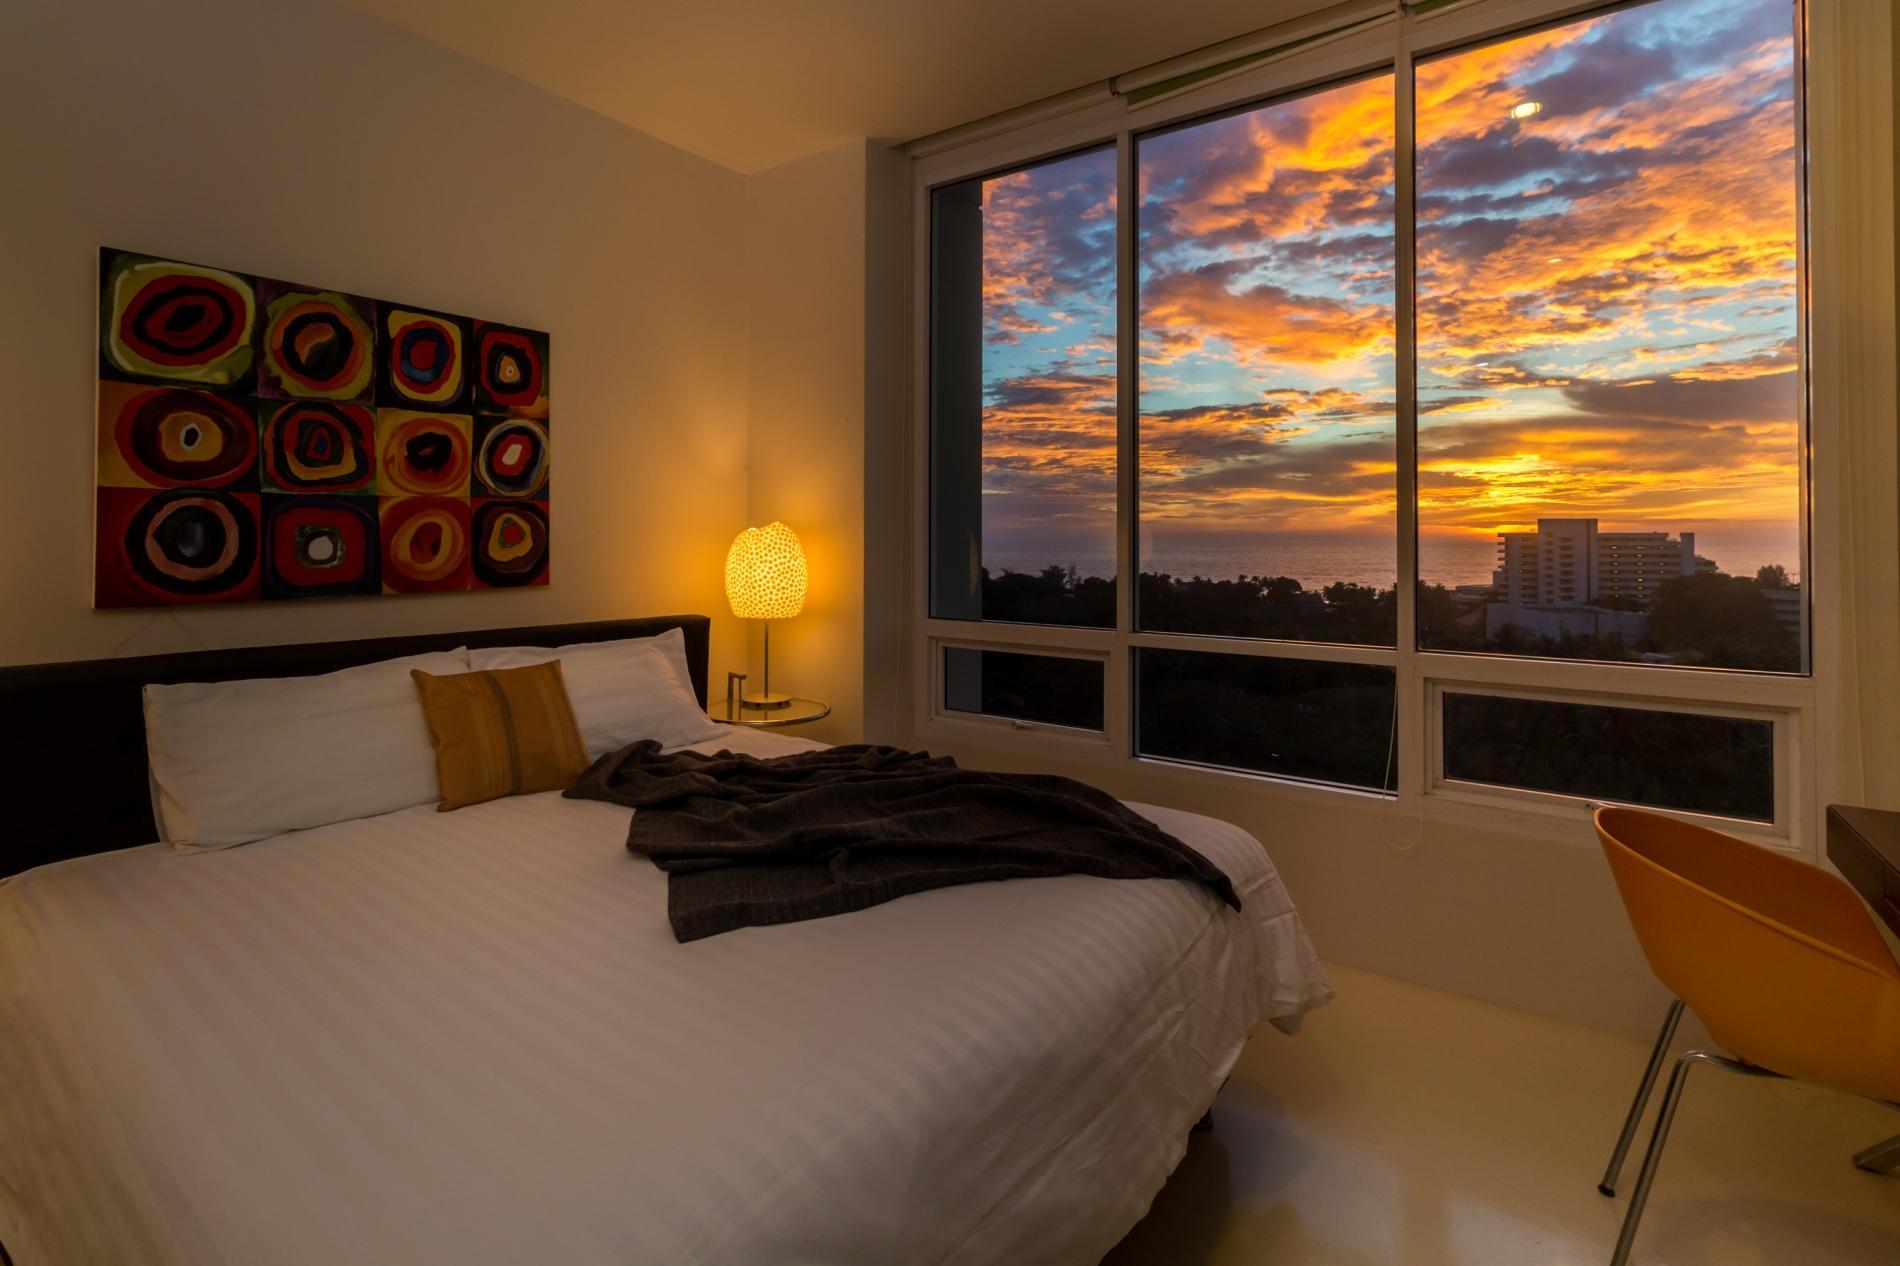 Apartment KH2605 - Sea-view Penthouse in Karon  walk to beach  restaurants  bars  shops photo 18858715